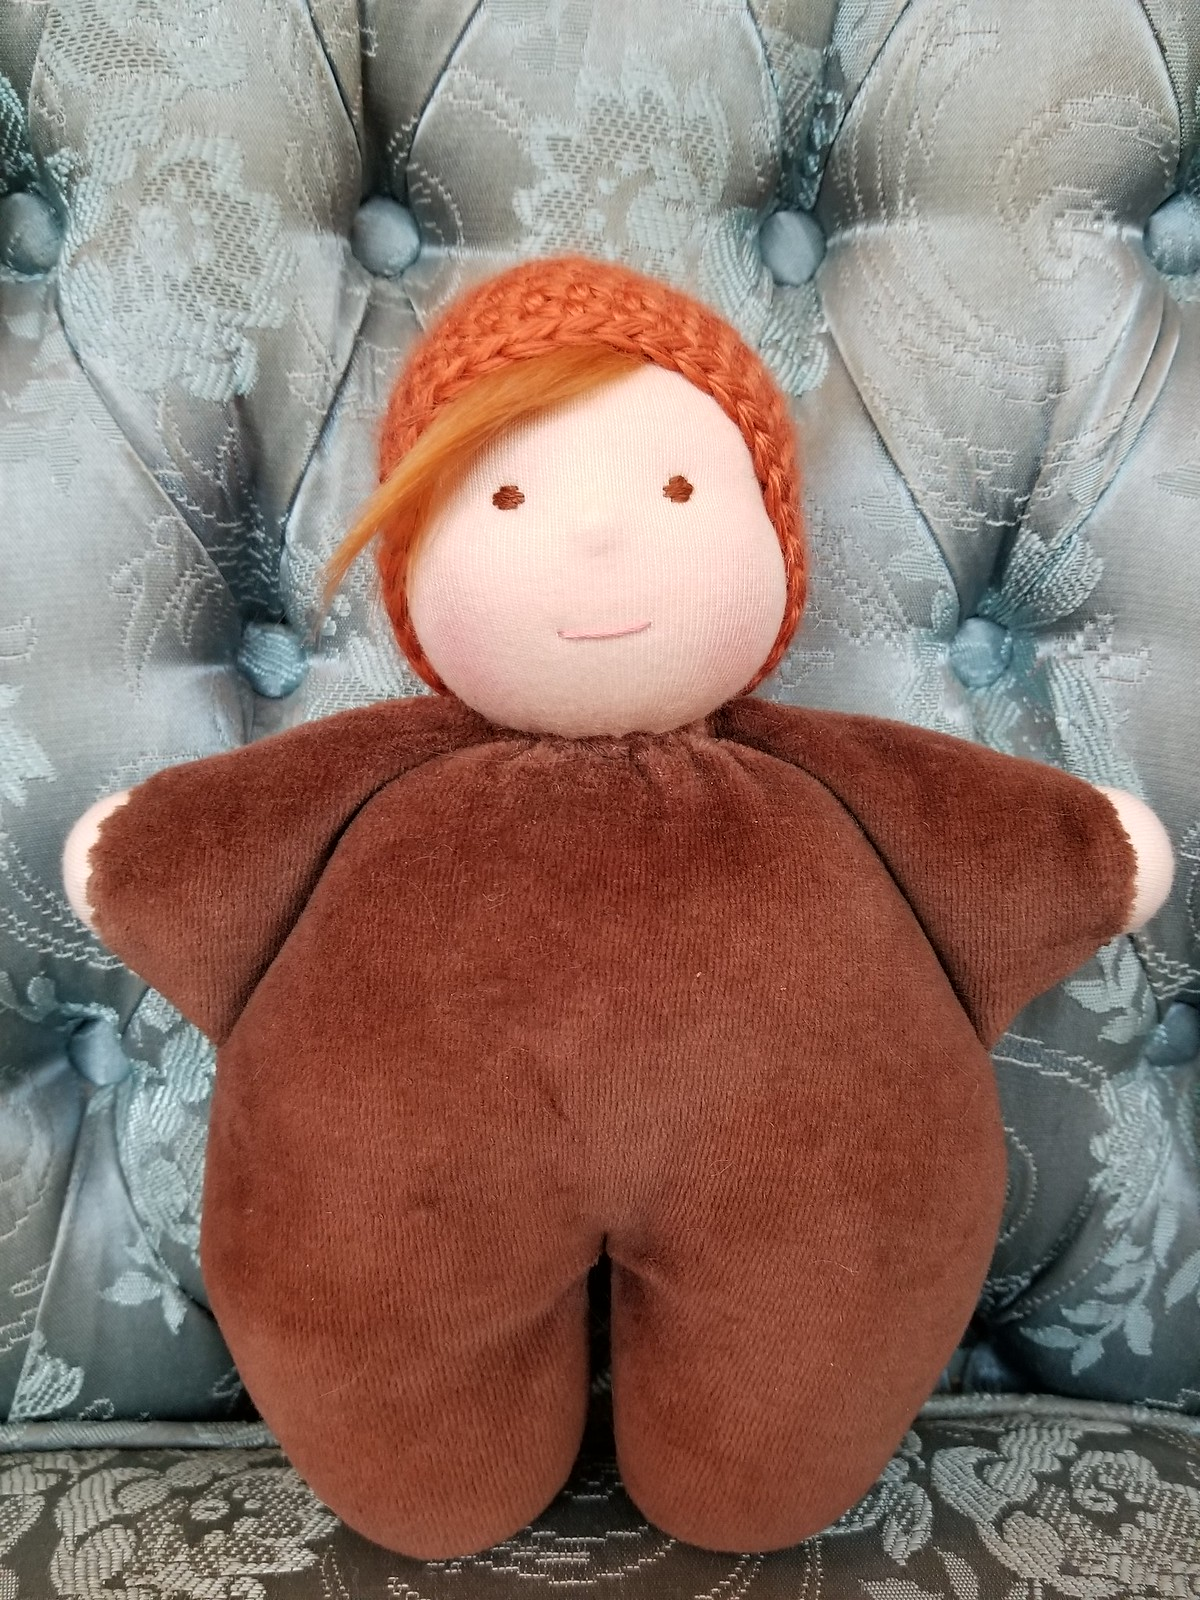 Snuggle Baby #4 - Brown/Orange